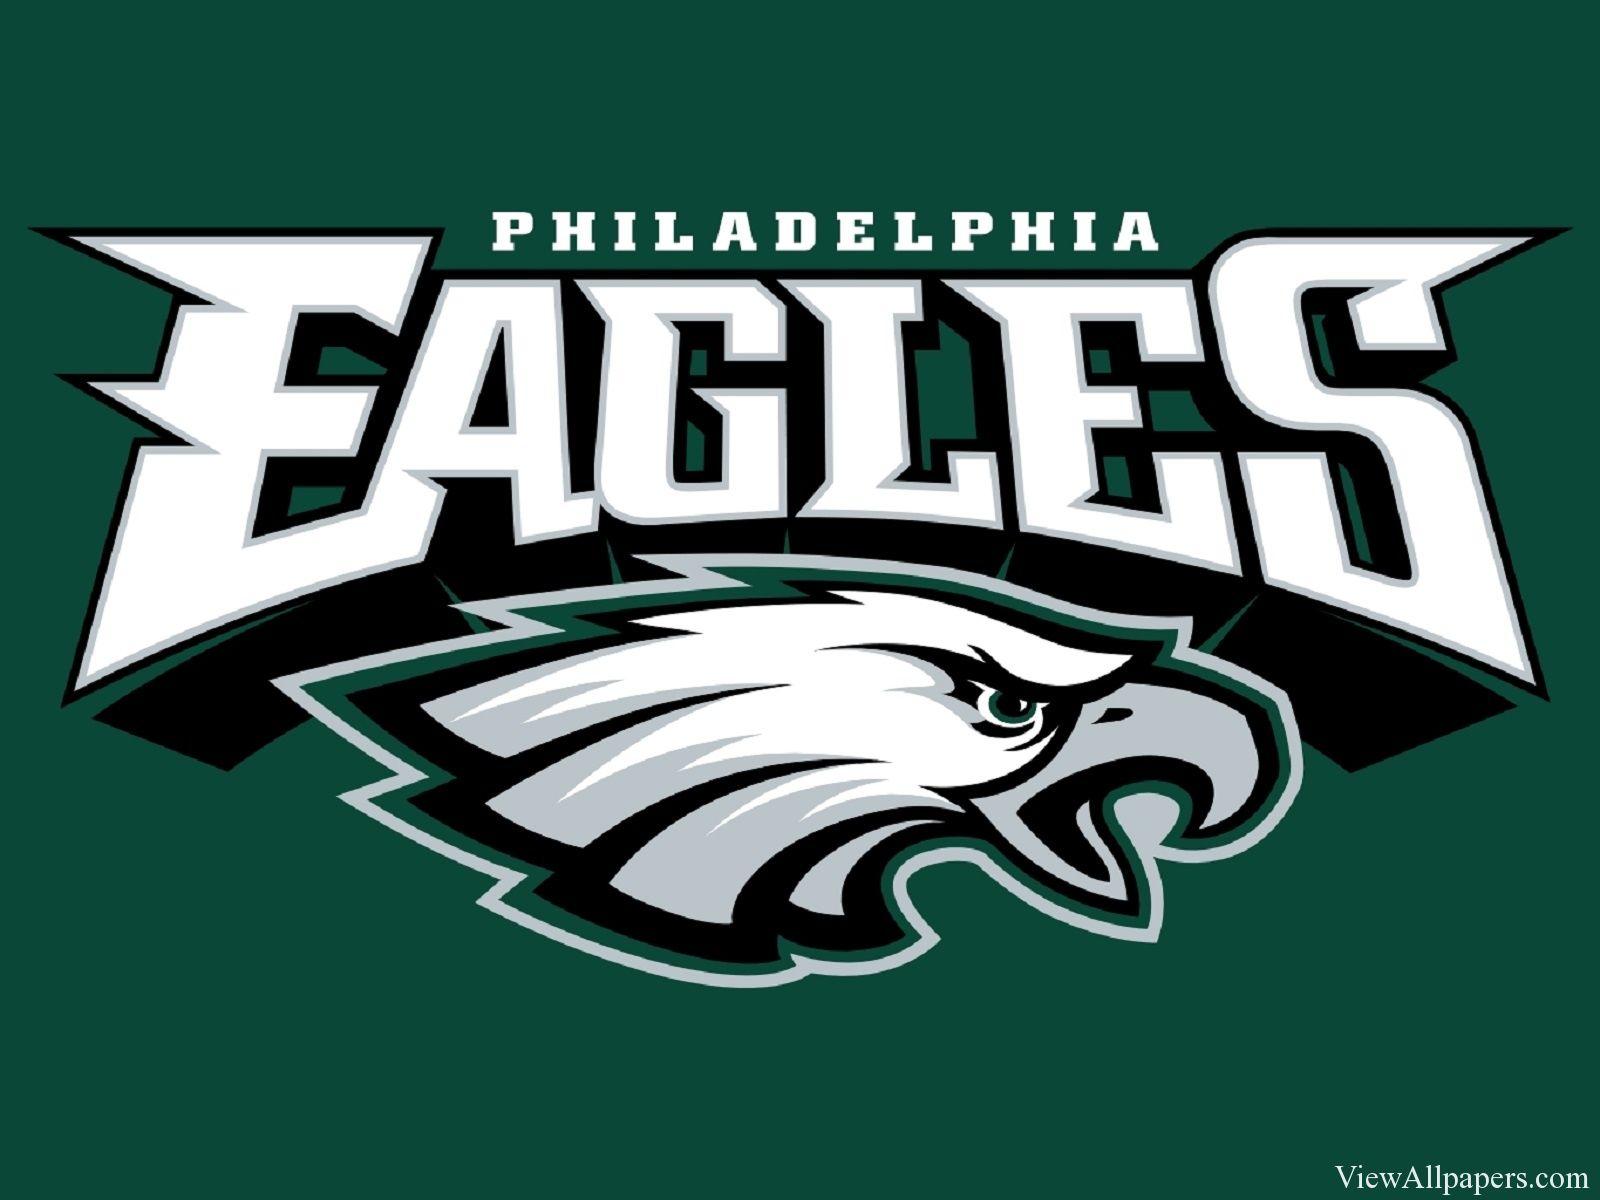 NFL Philadelphia Eagles Super Bowl LII Champions Die Cut Static Cling